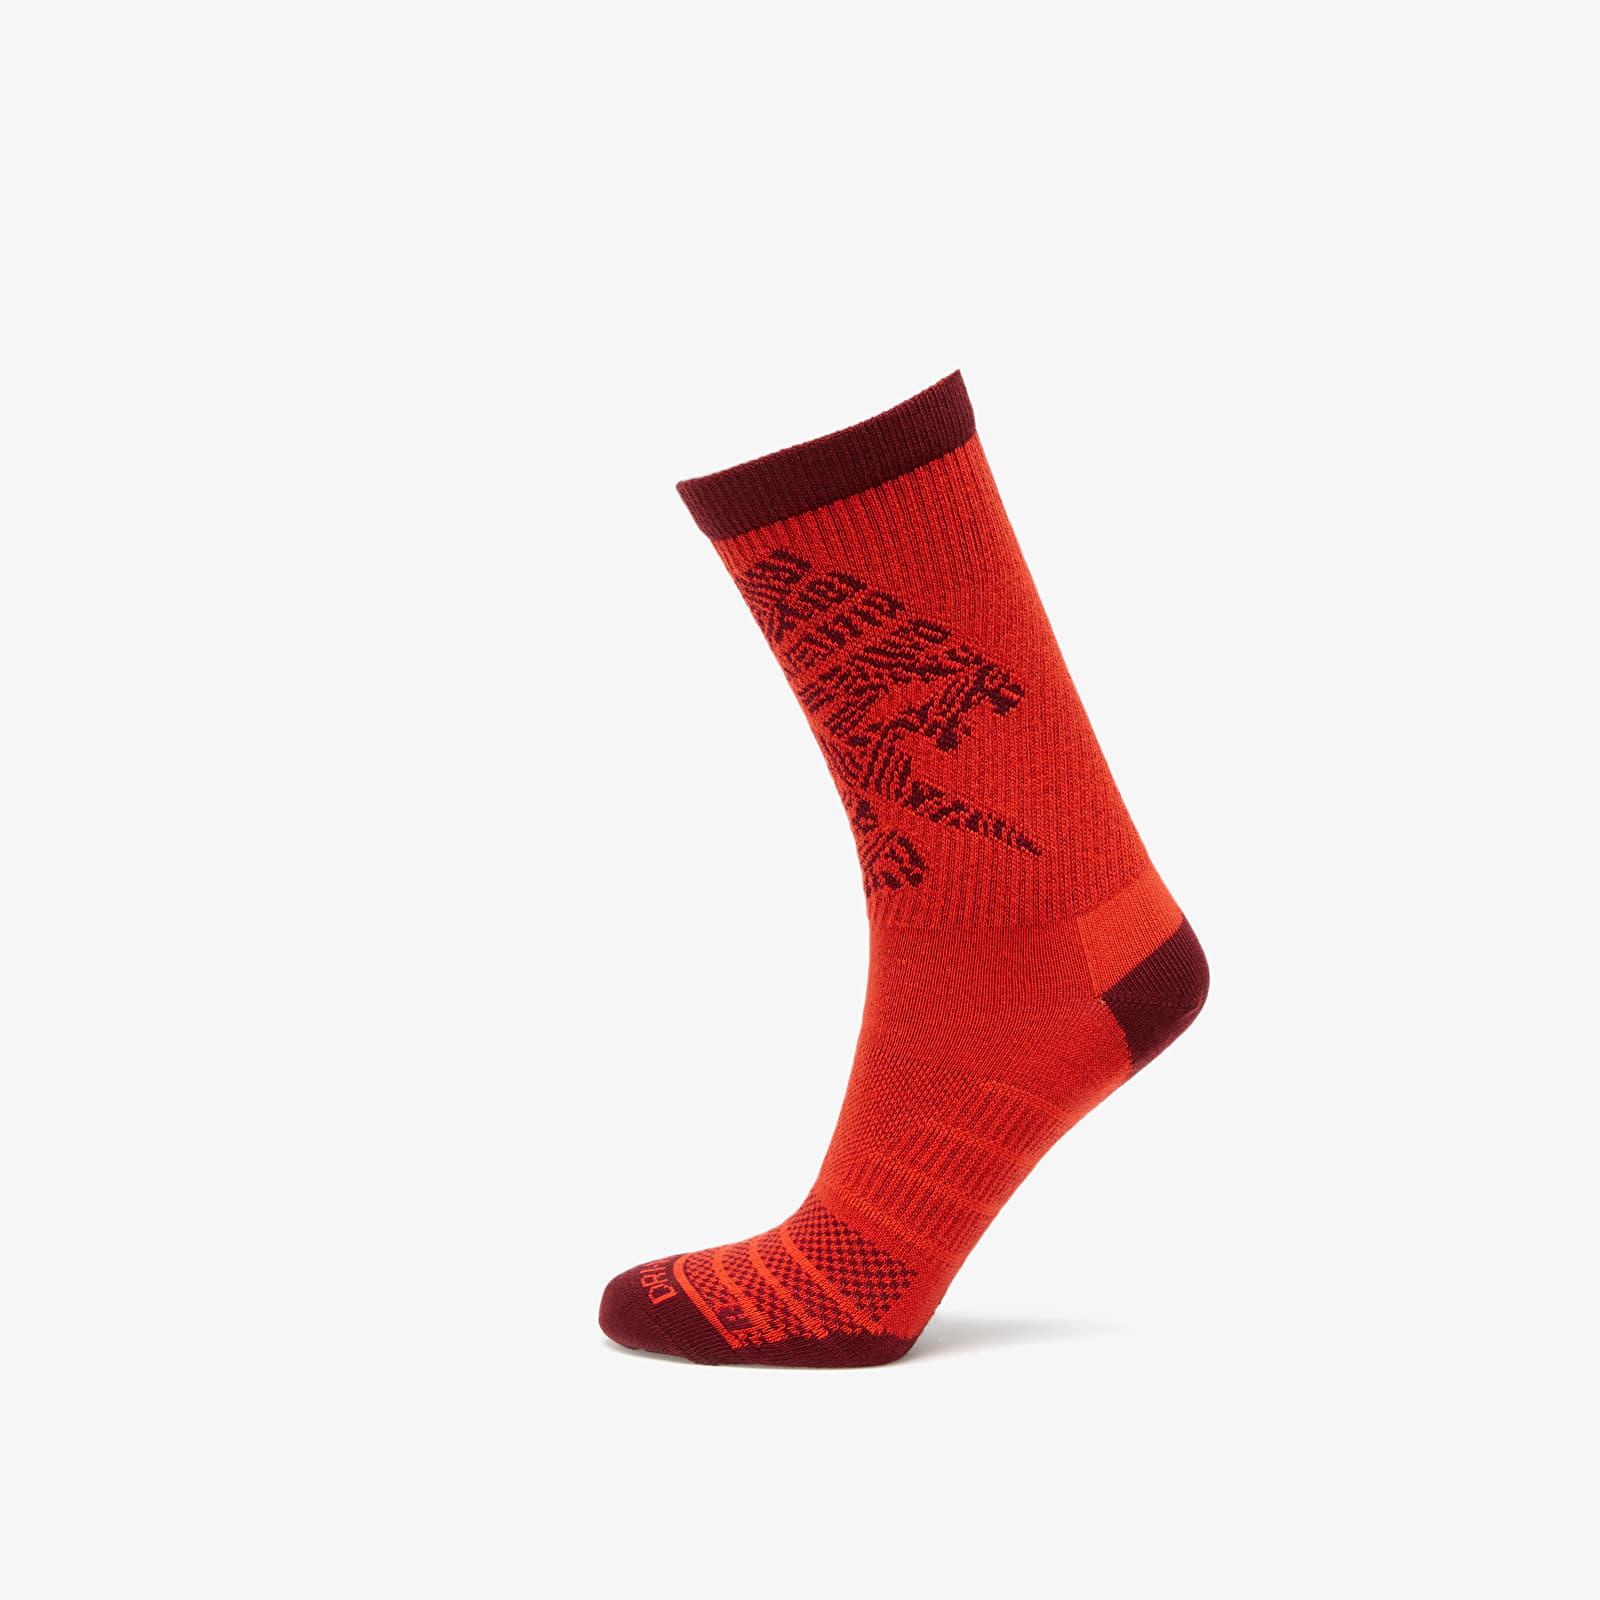 Čarape Nike SB Everyday Max Lightweight Skate Crew Socks (3 Pairs) Multi-Color